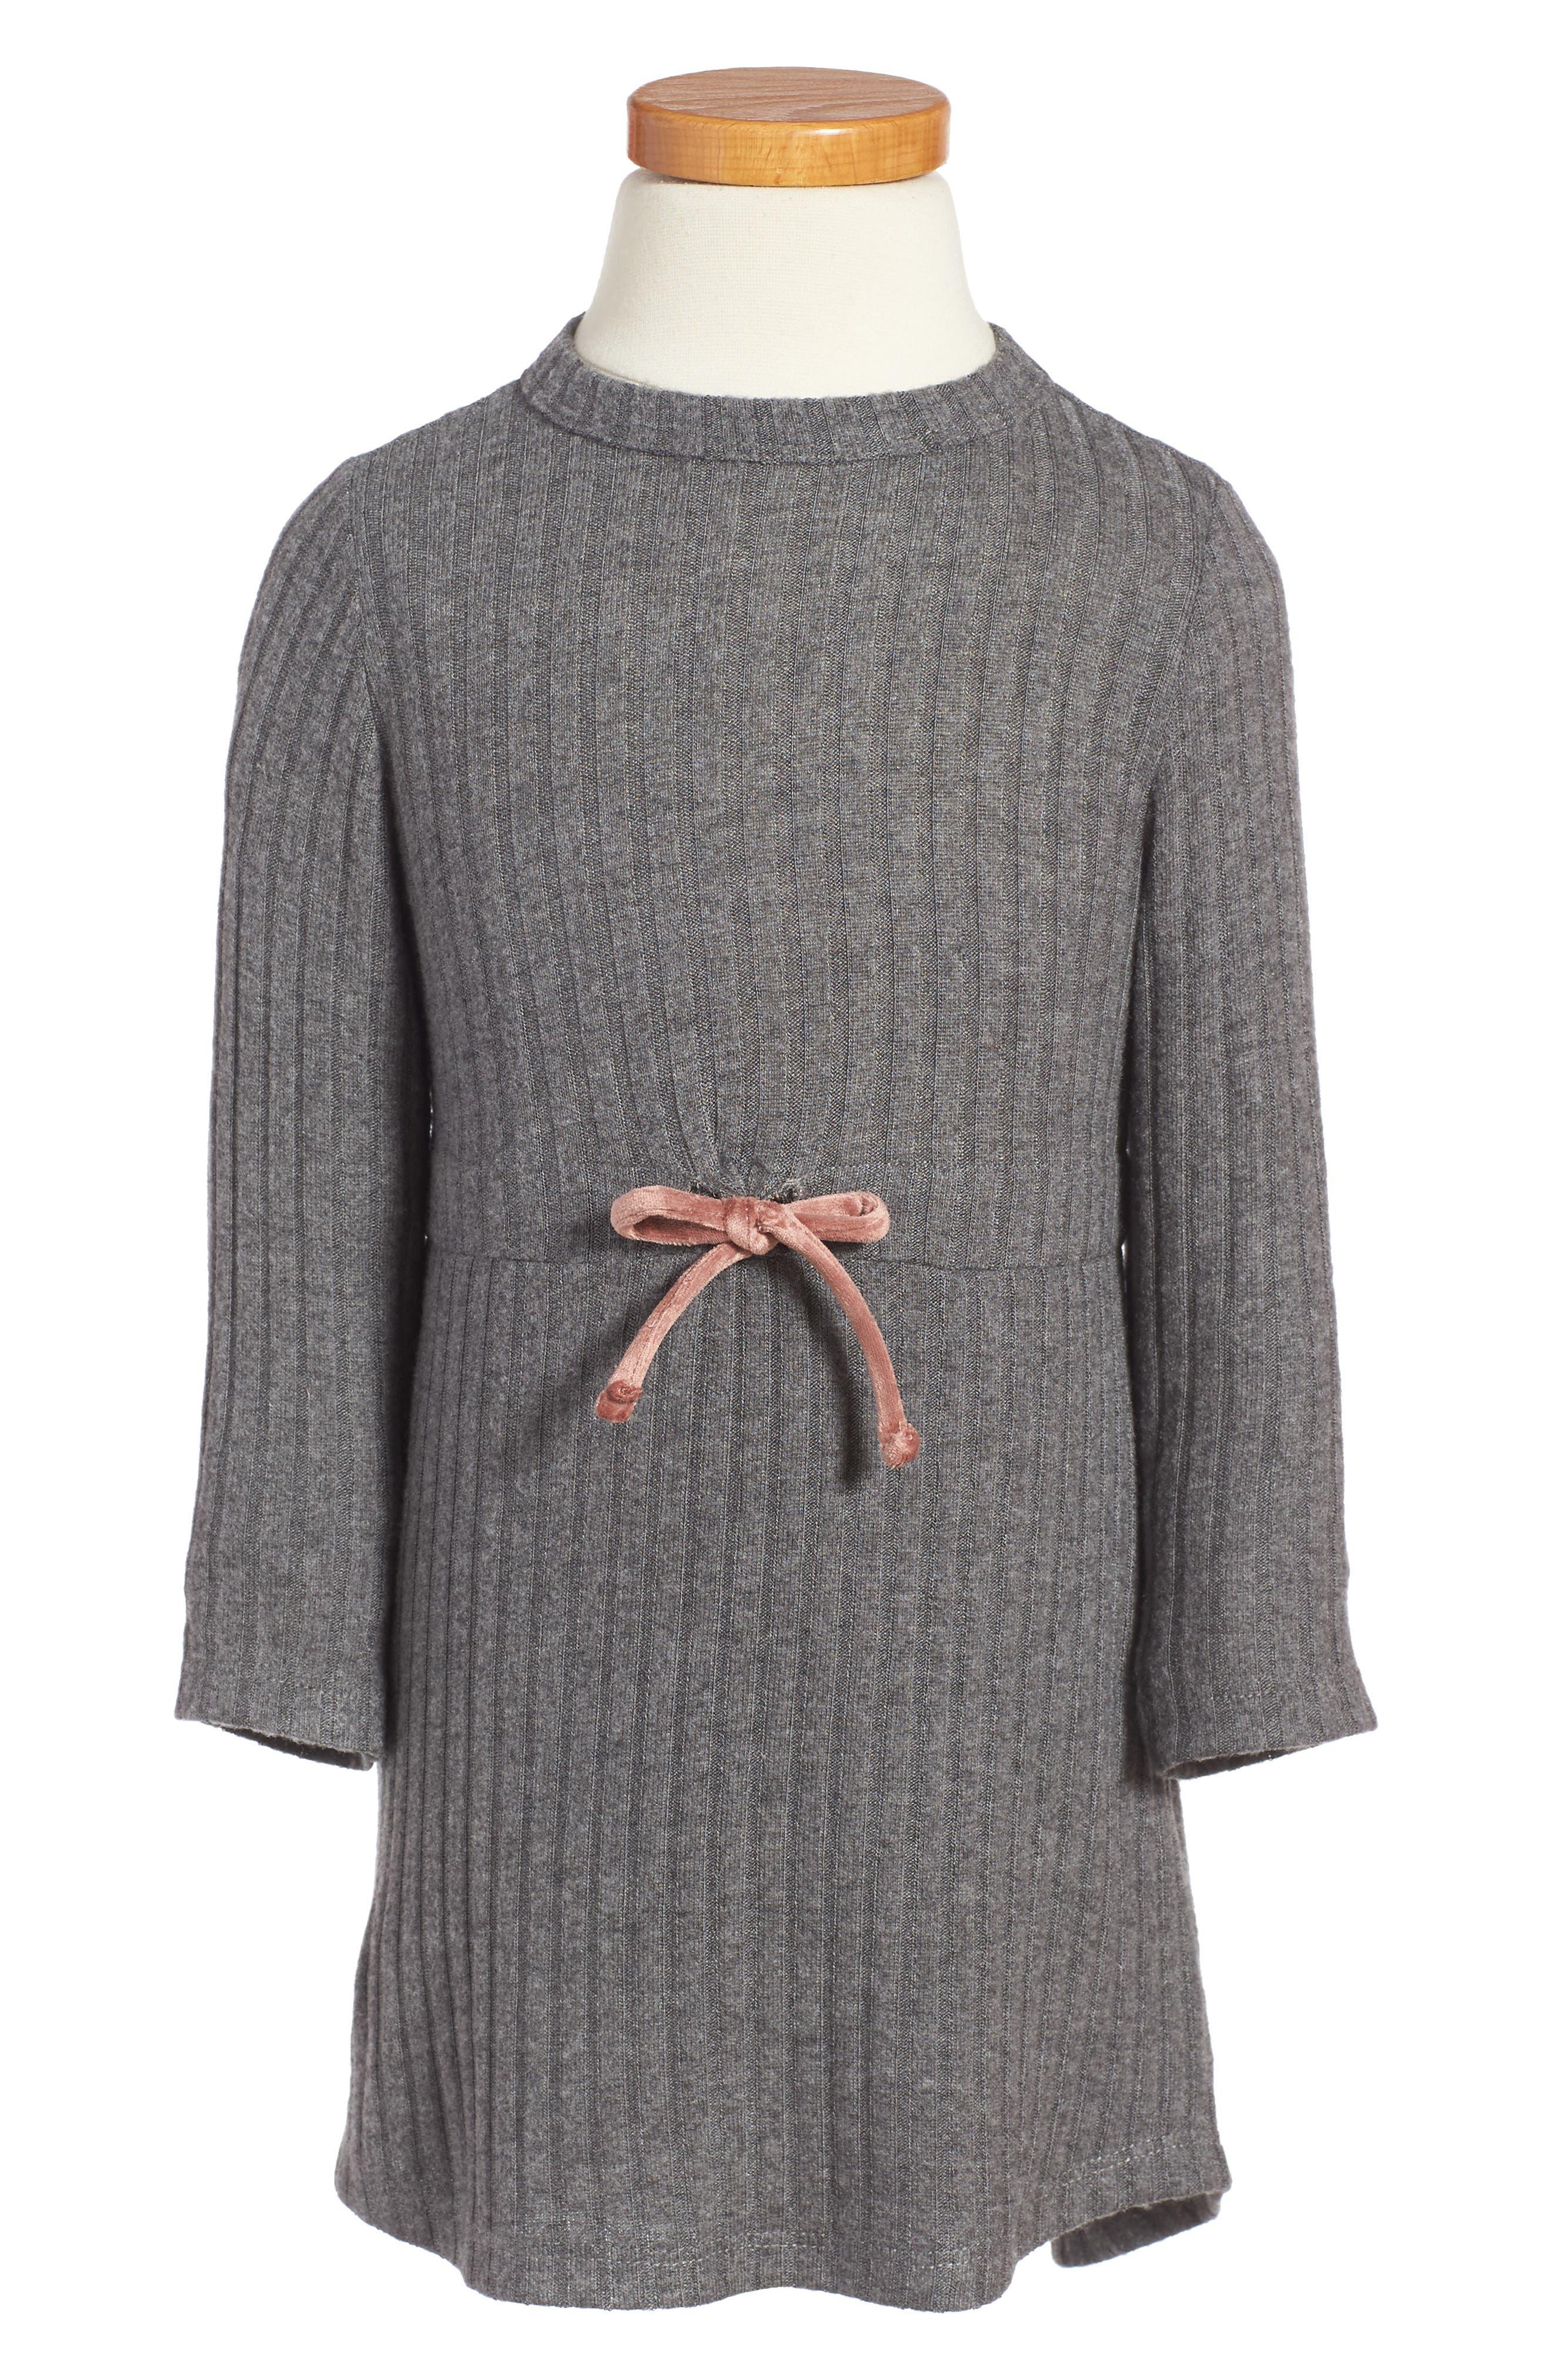 Alternate Image 1 Selected - BERU Ellana Ribbed Sweater Dress (Toddler Girls & Little Girls)